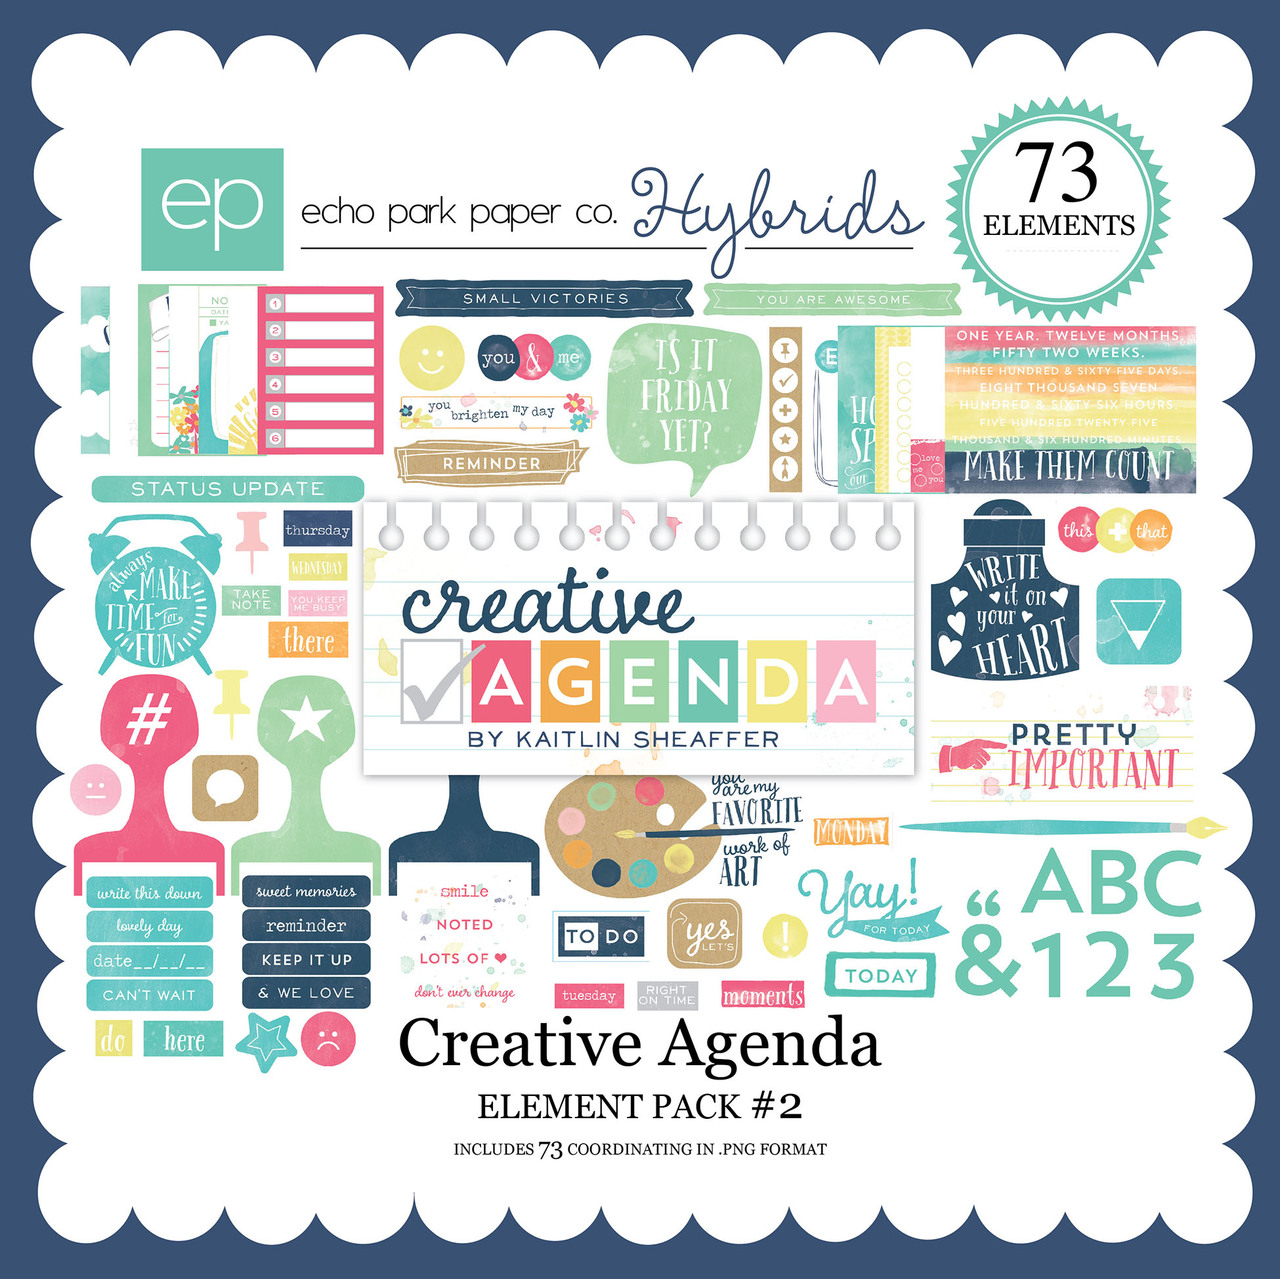 Creative Agenda Element Pack #2